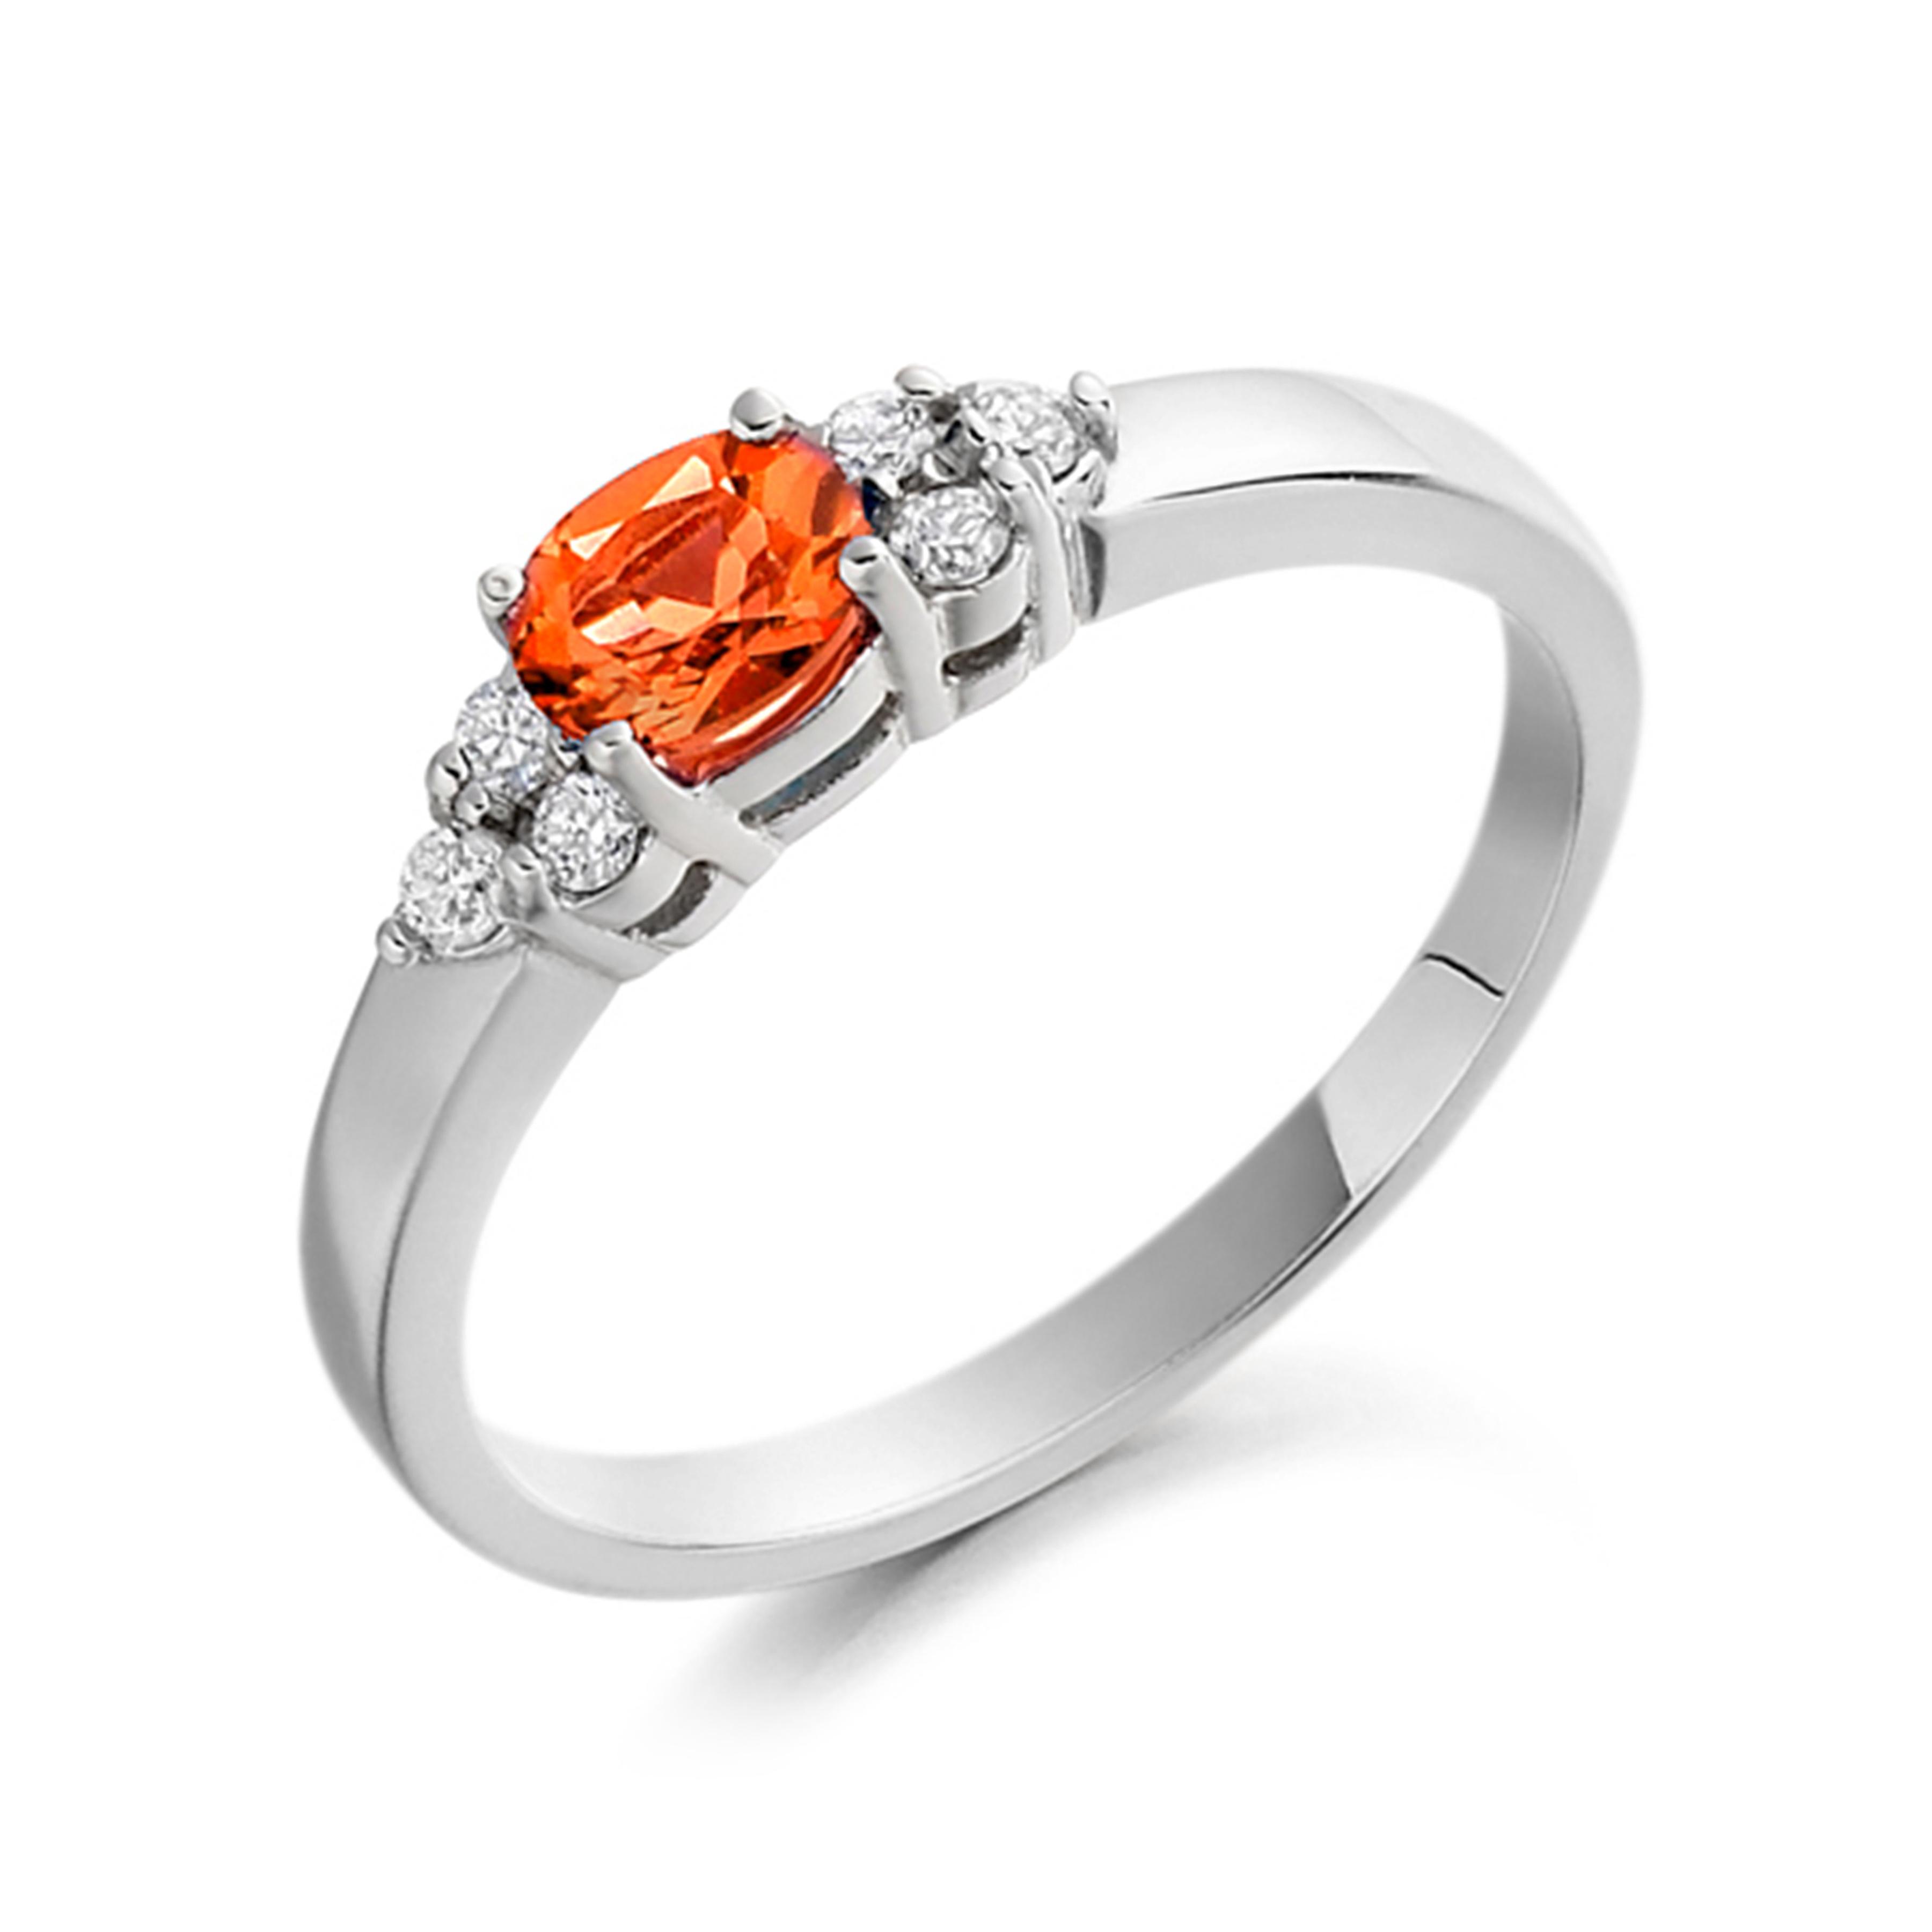 Gemstone Ring With 0.35ct Princess Shape Emerald and Diamonds